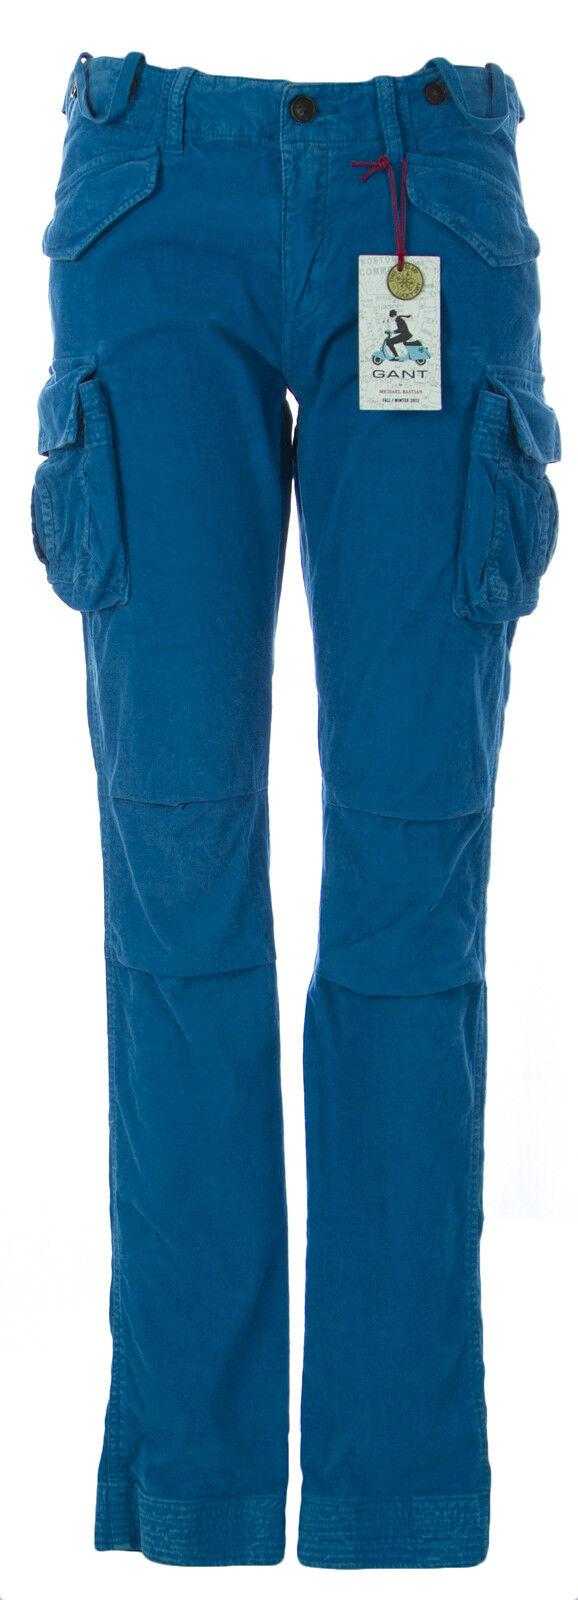 Gant Femme Bleu Océan Pinwale Skinny Pantalon voiturego 414573   240 Neuf